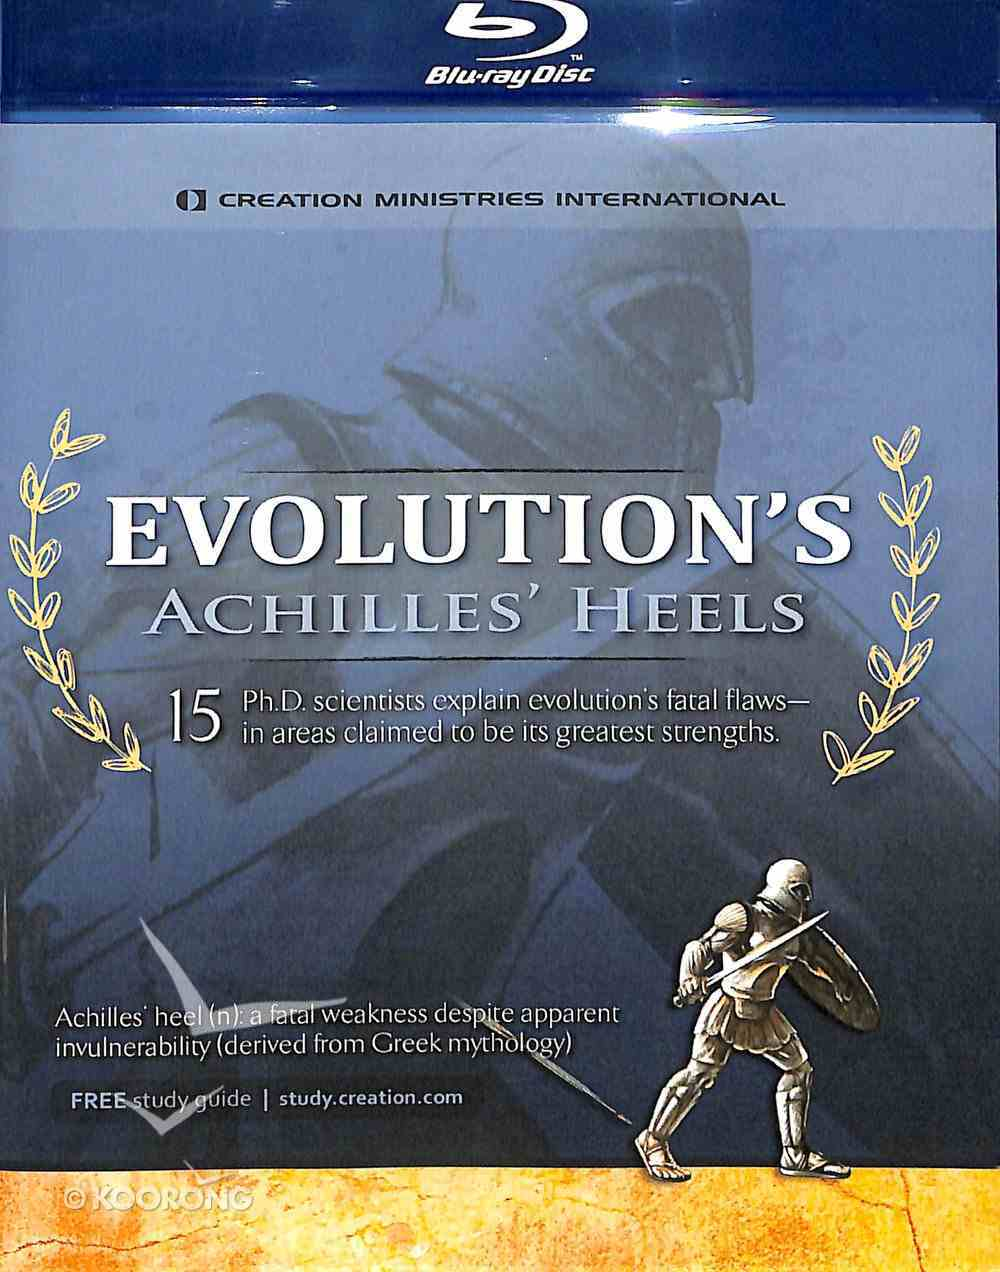 Evolution's Achilles' Heels (Blu-ray) Blu-ray Disc